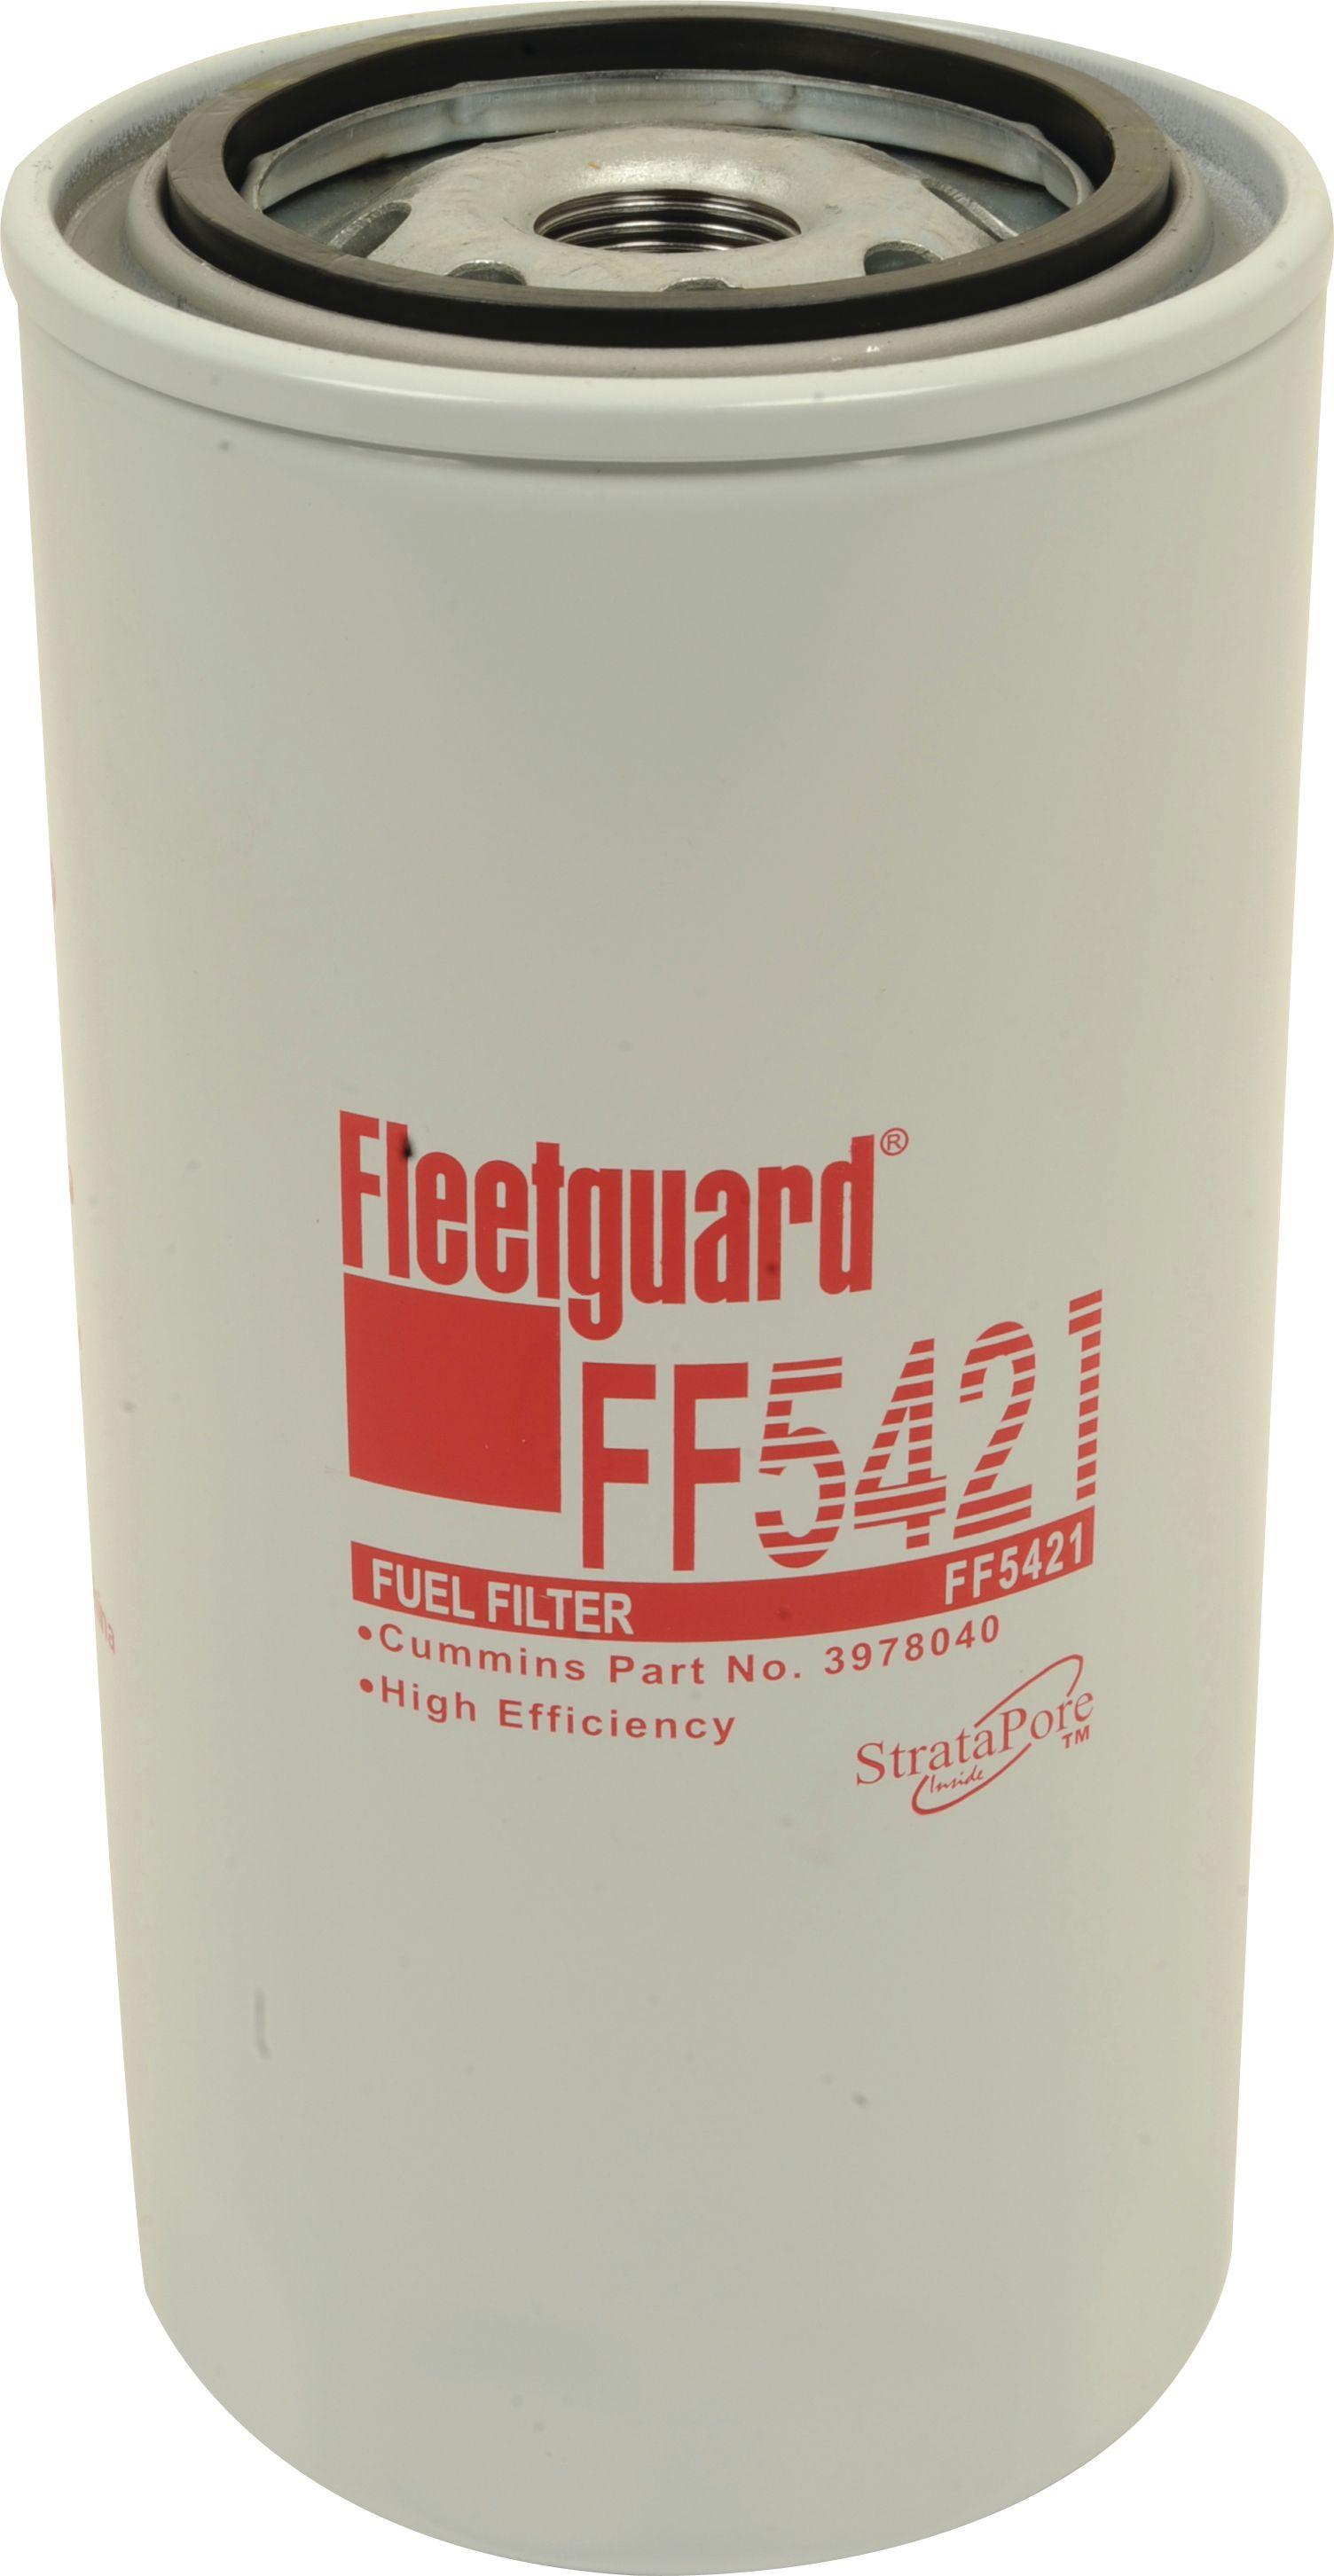 STEYR FUEL FILTER FF5421 73143